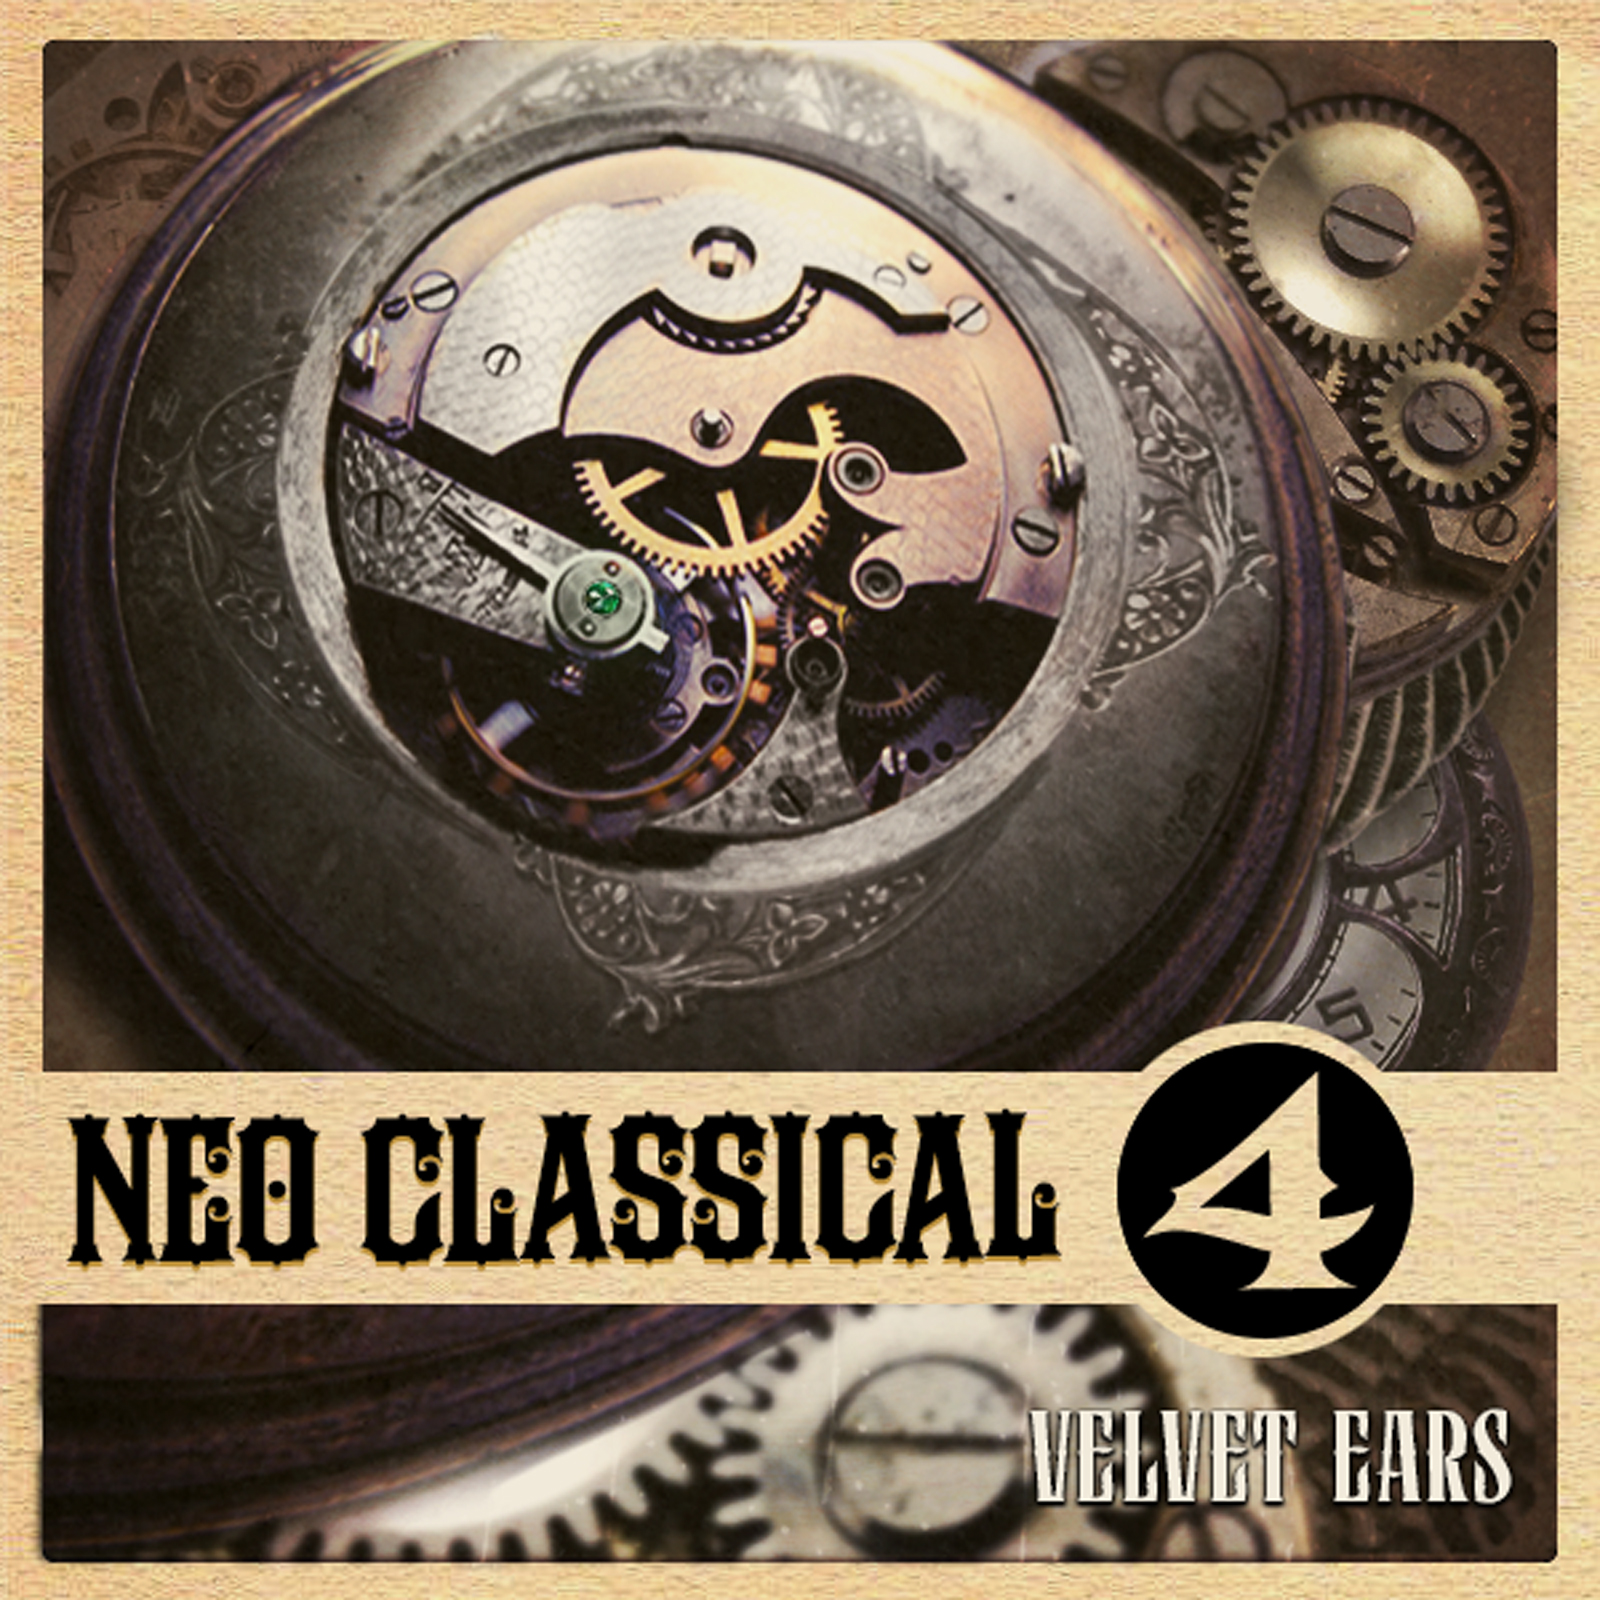 NEOCLASSICAL_steampunk_4-1600.jpg